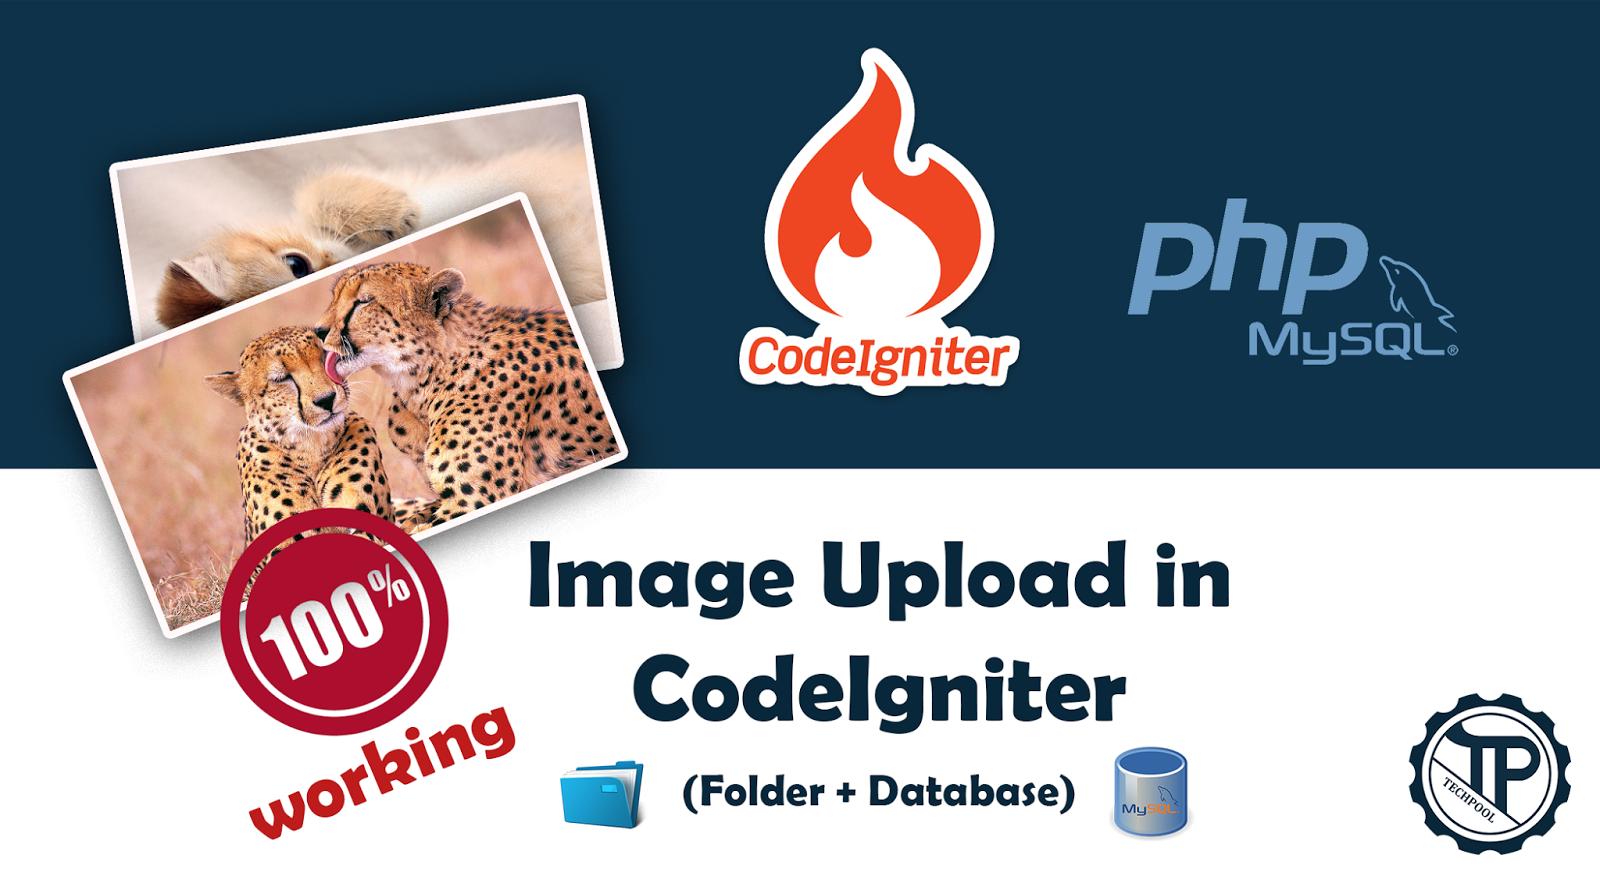 Codeigniter Image Upload